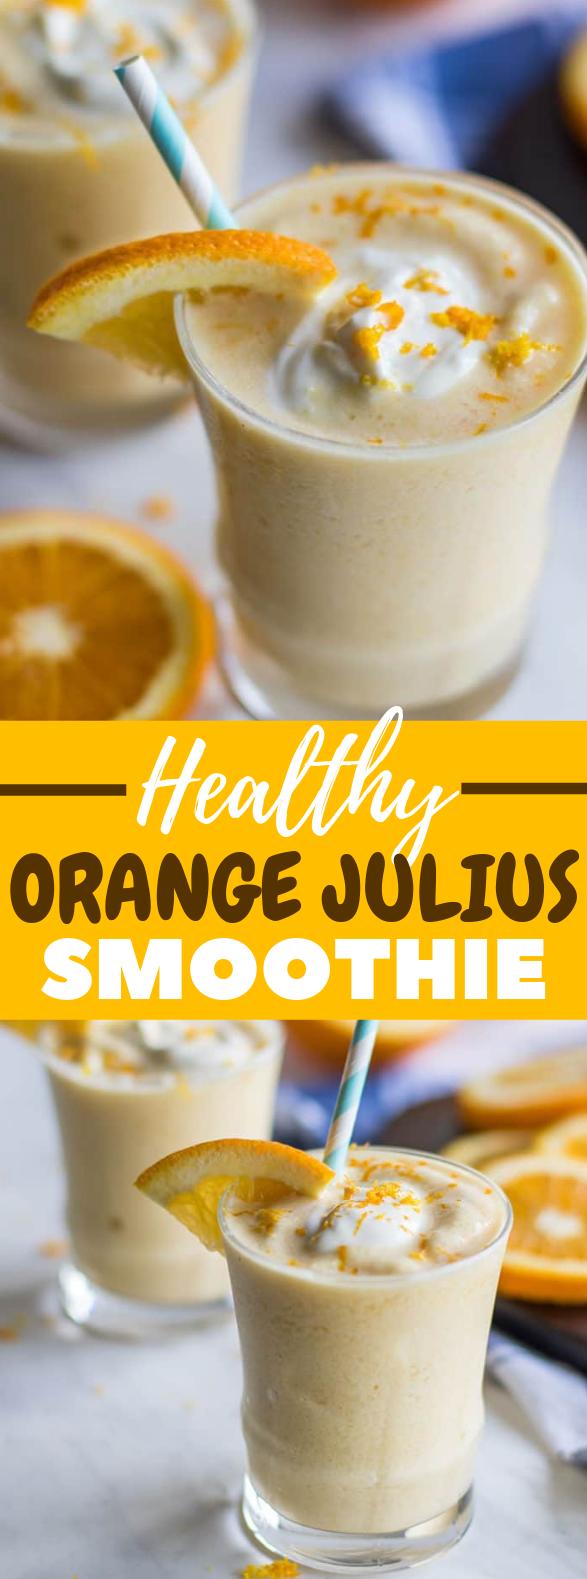 Healthy Orange Julius Smoothie #drink #healthydrink